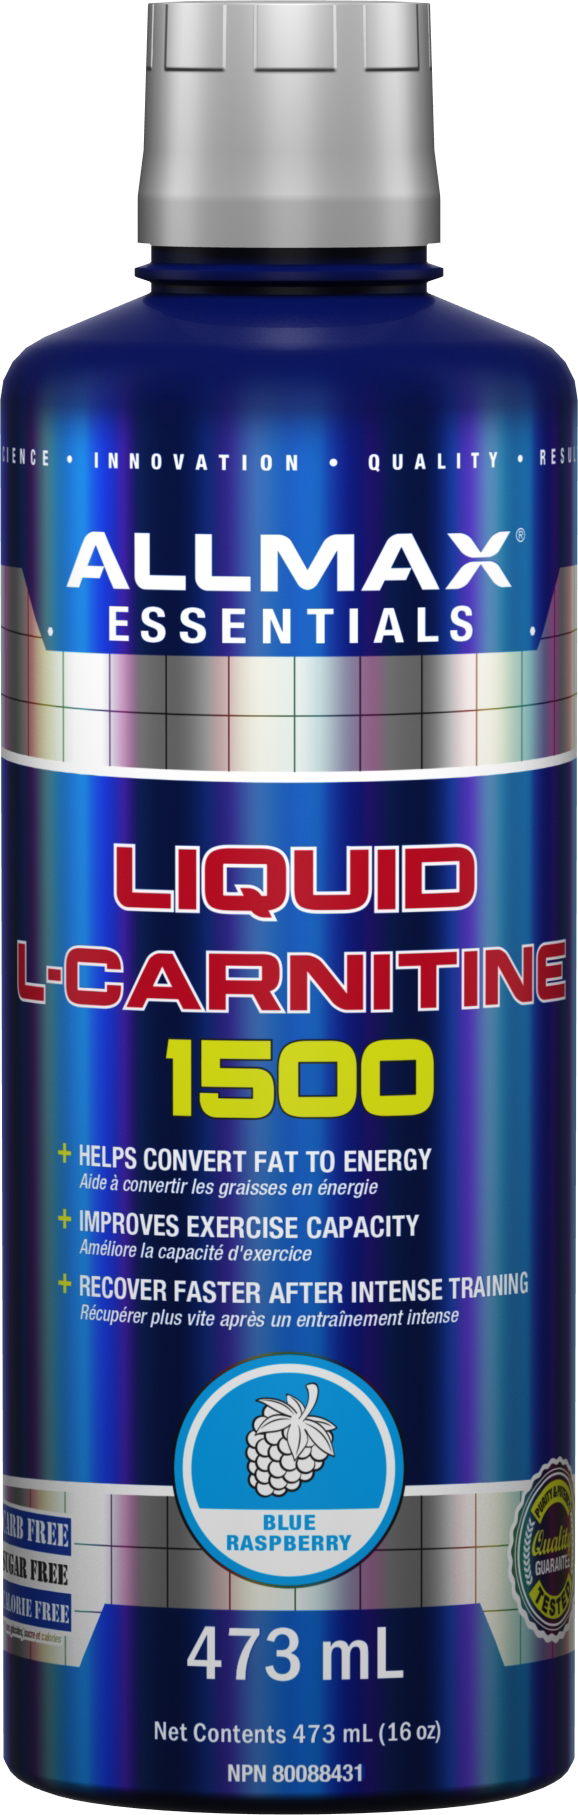 Allmax Nutrition Allmax - Liquid L-Carnitine 1500 - Blue Raspberry - 473ml